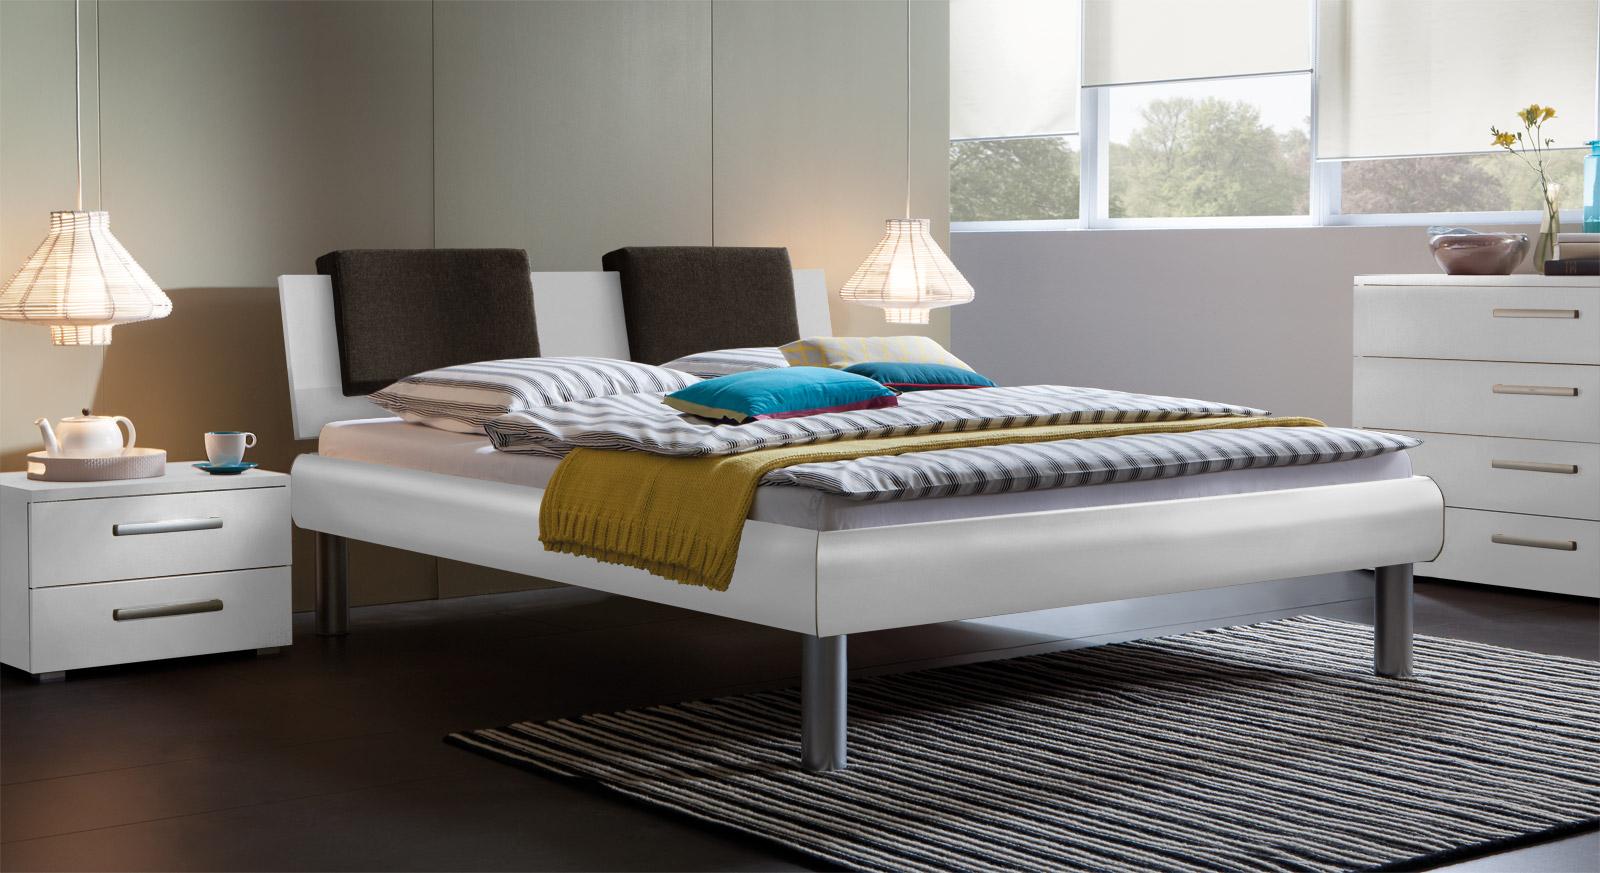 Full Size of Betten 200x200 Gnstiges Doppelbett In Z B Cm Enna Bettende Düsseldorf Treca Ebay Bett 200x220 Joop Mit Matratze Und Lattenrost 140x200 Weiß Berlin Weiße Bett Betten 200x200